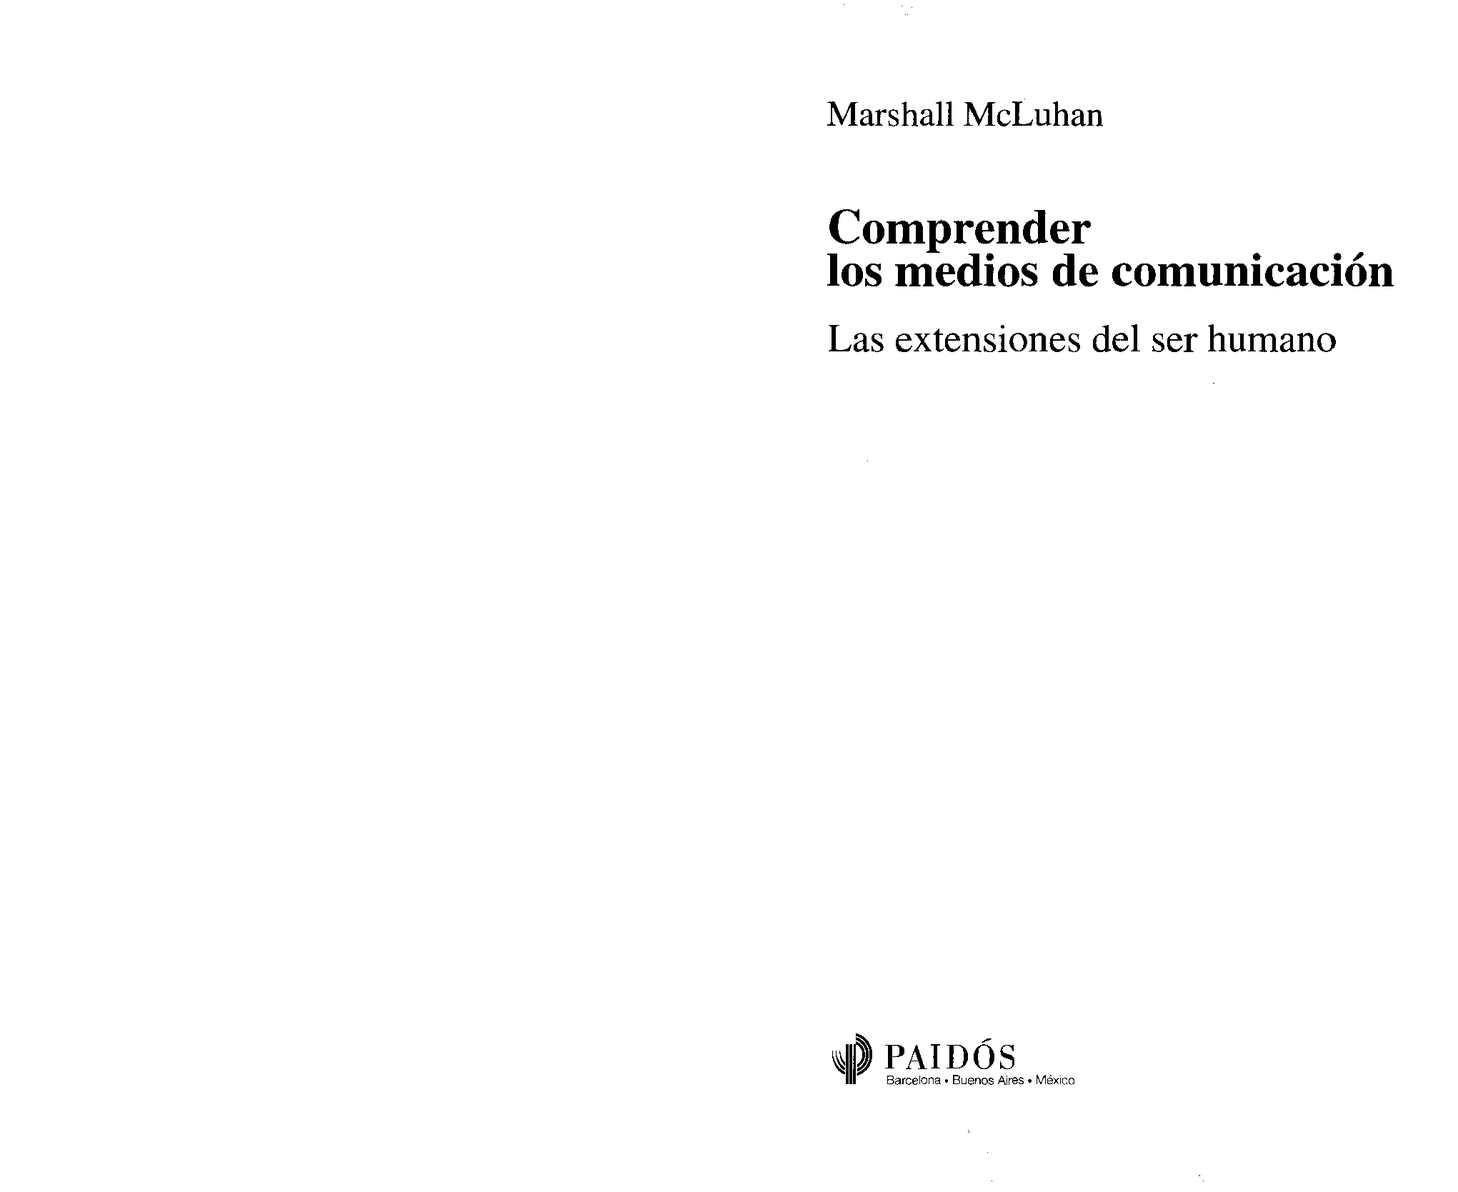 Calaméo - McLuhan_Marshall__Comprender_los_medios_de_comunicacion